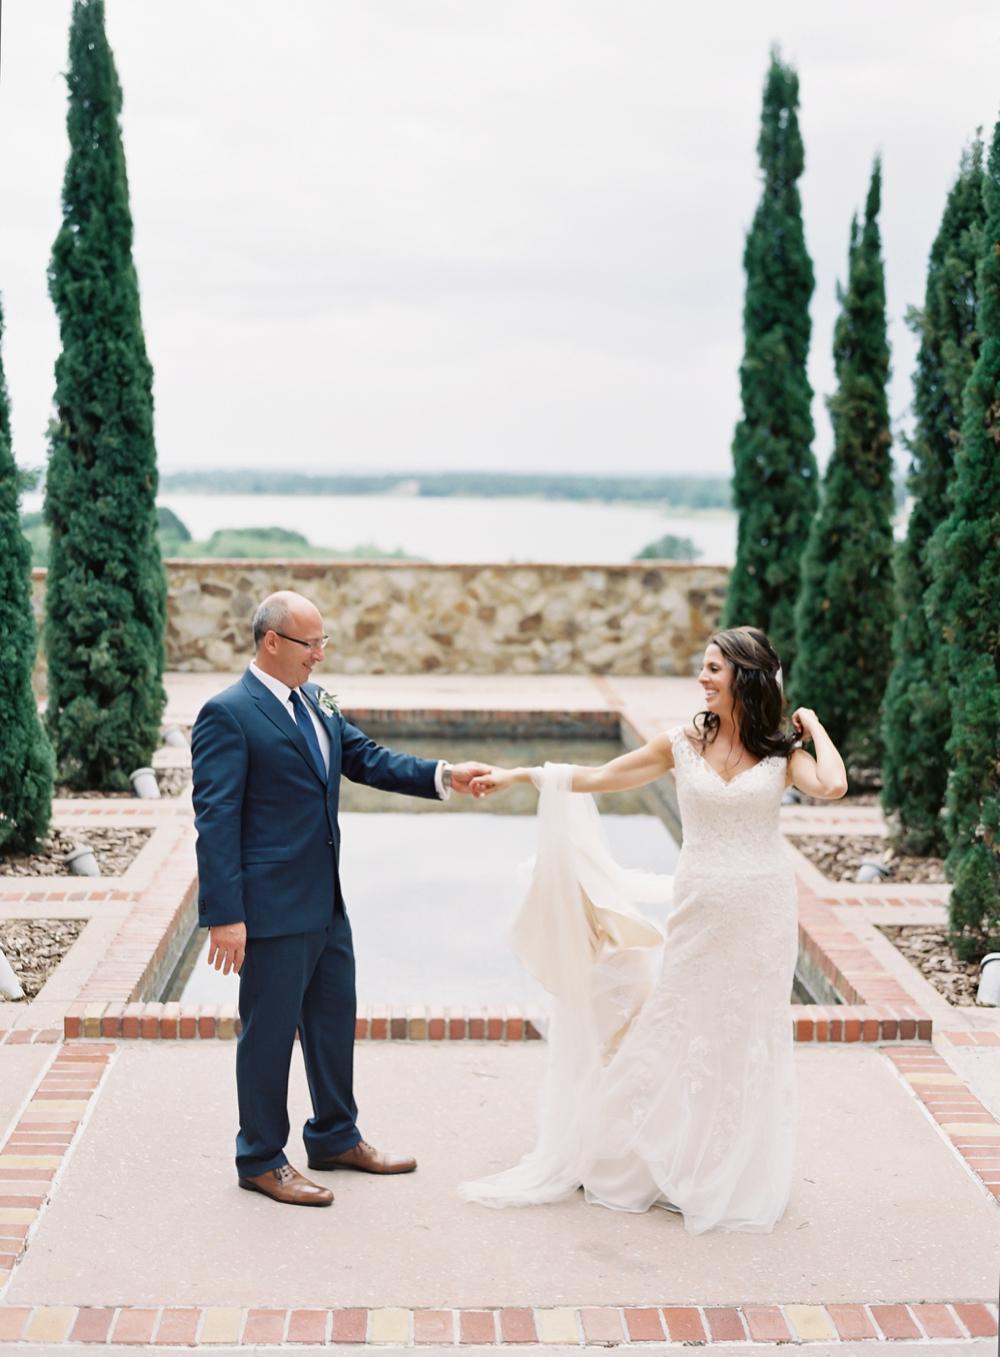 Vicki Grafton Photography - Fine Art Film Wedding Photographer - Bella Collina Wedding_0067.jpg